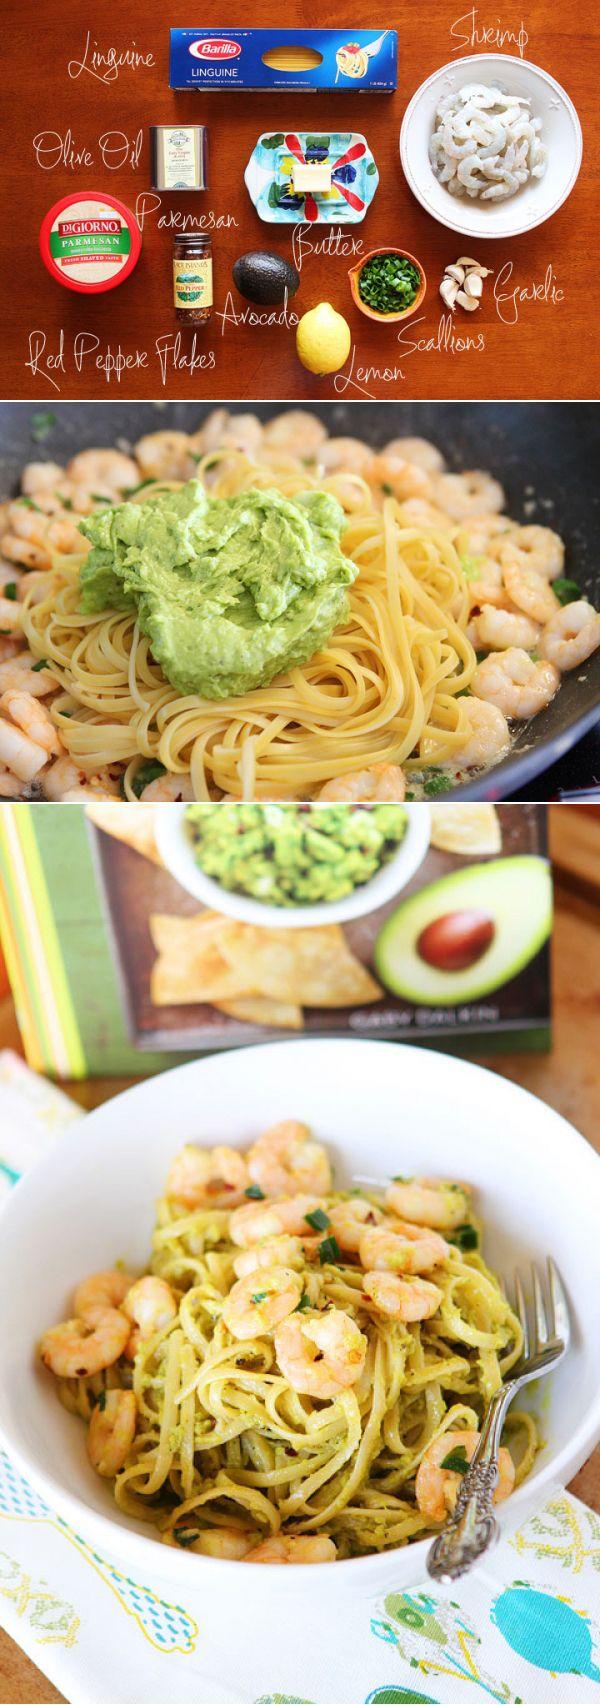 Shrimp & Avocado Pasta. Easy and delicious! - Avocado, lemon, garlic, and freshly cracked pepper.